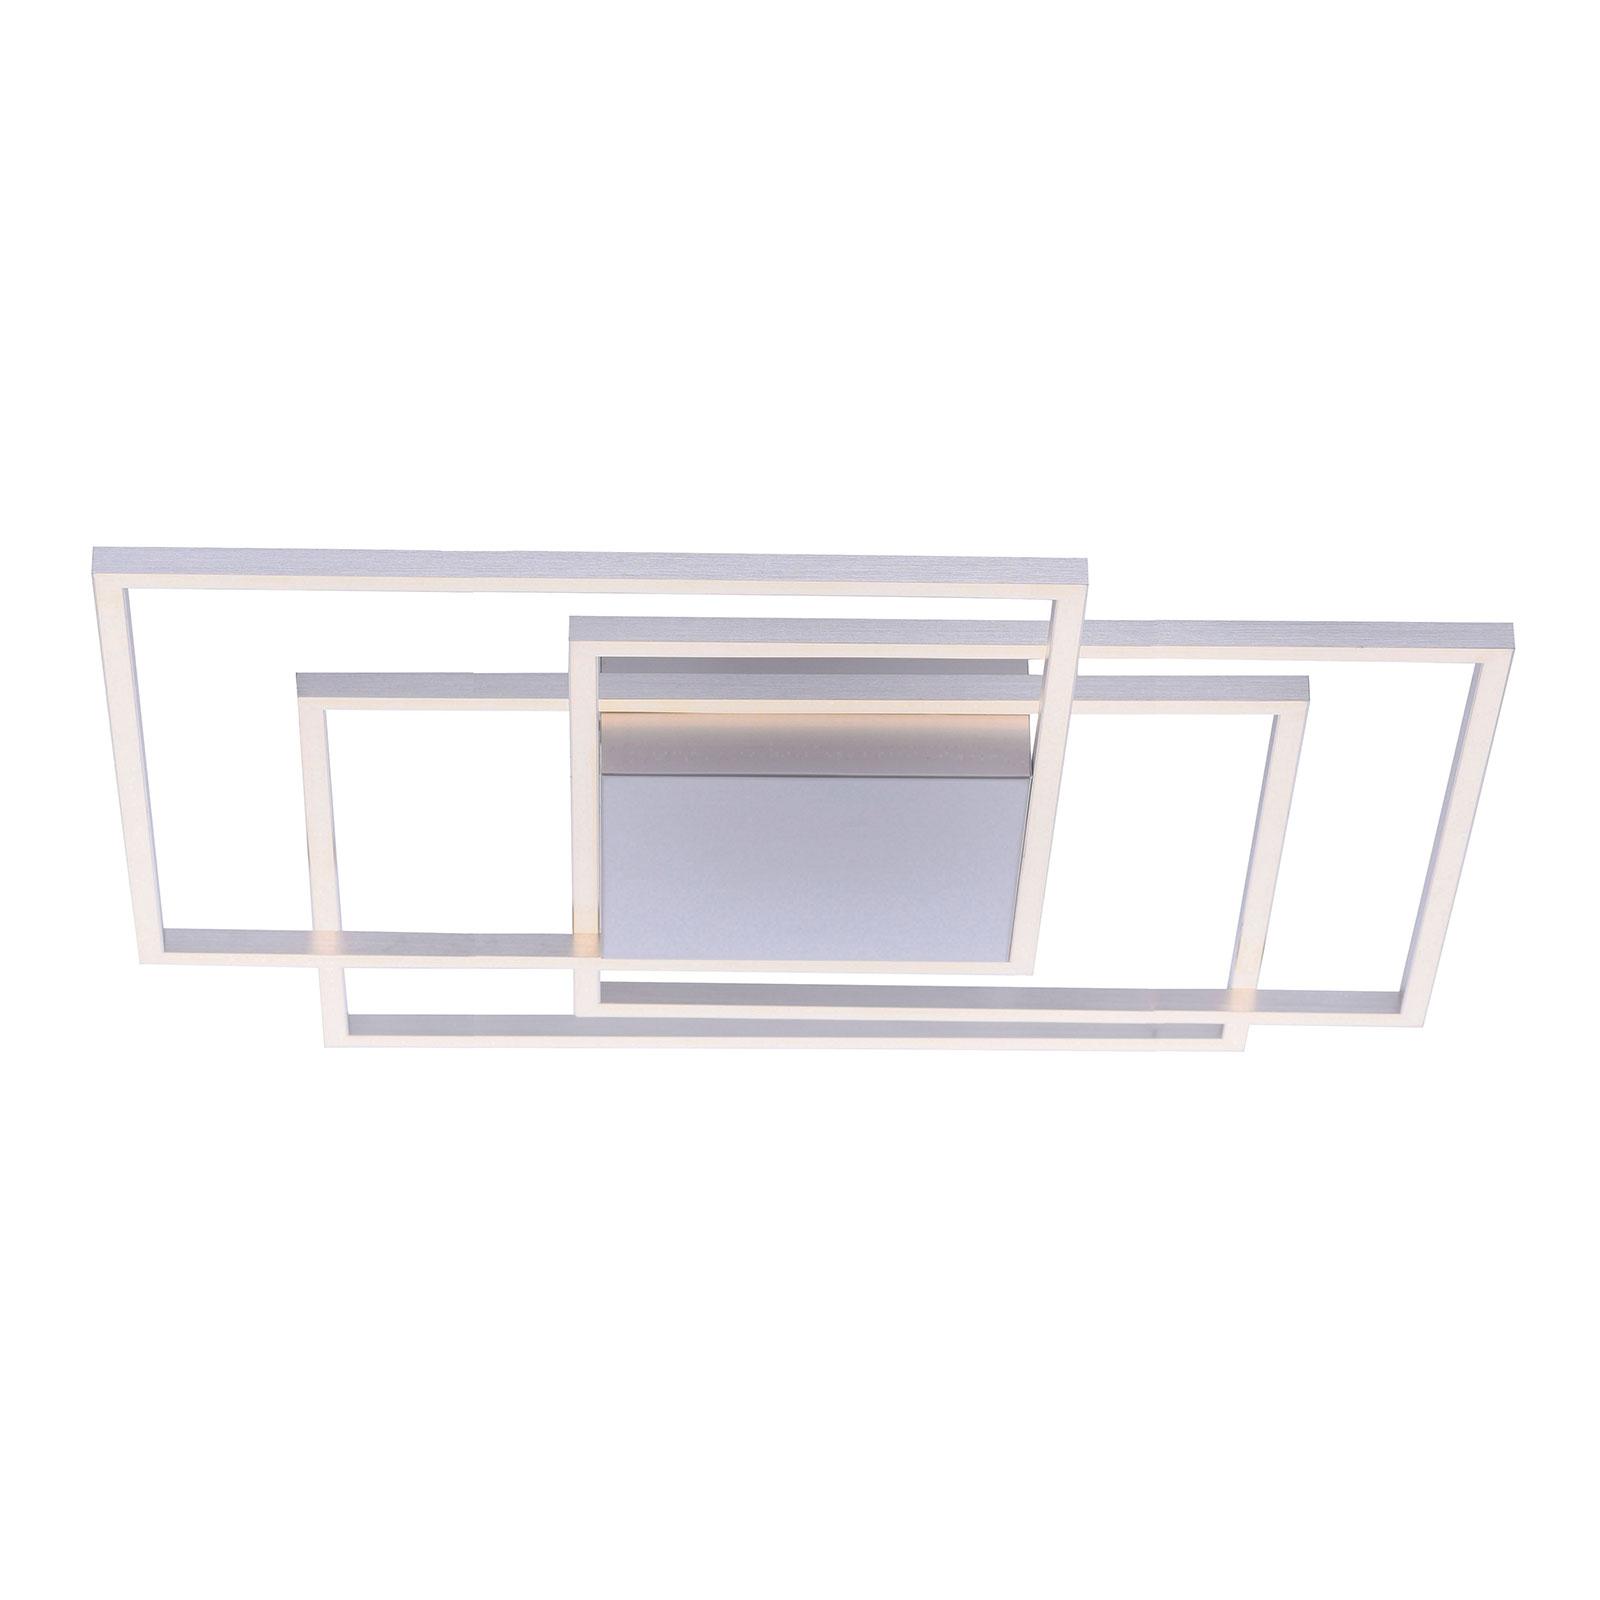 Paul Neuhaus Inigo LED-Deckenleuchte, 75 x 75 cm